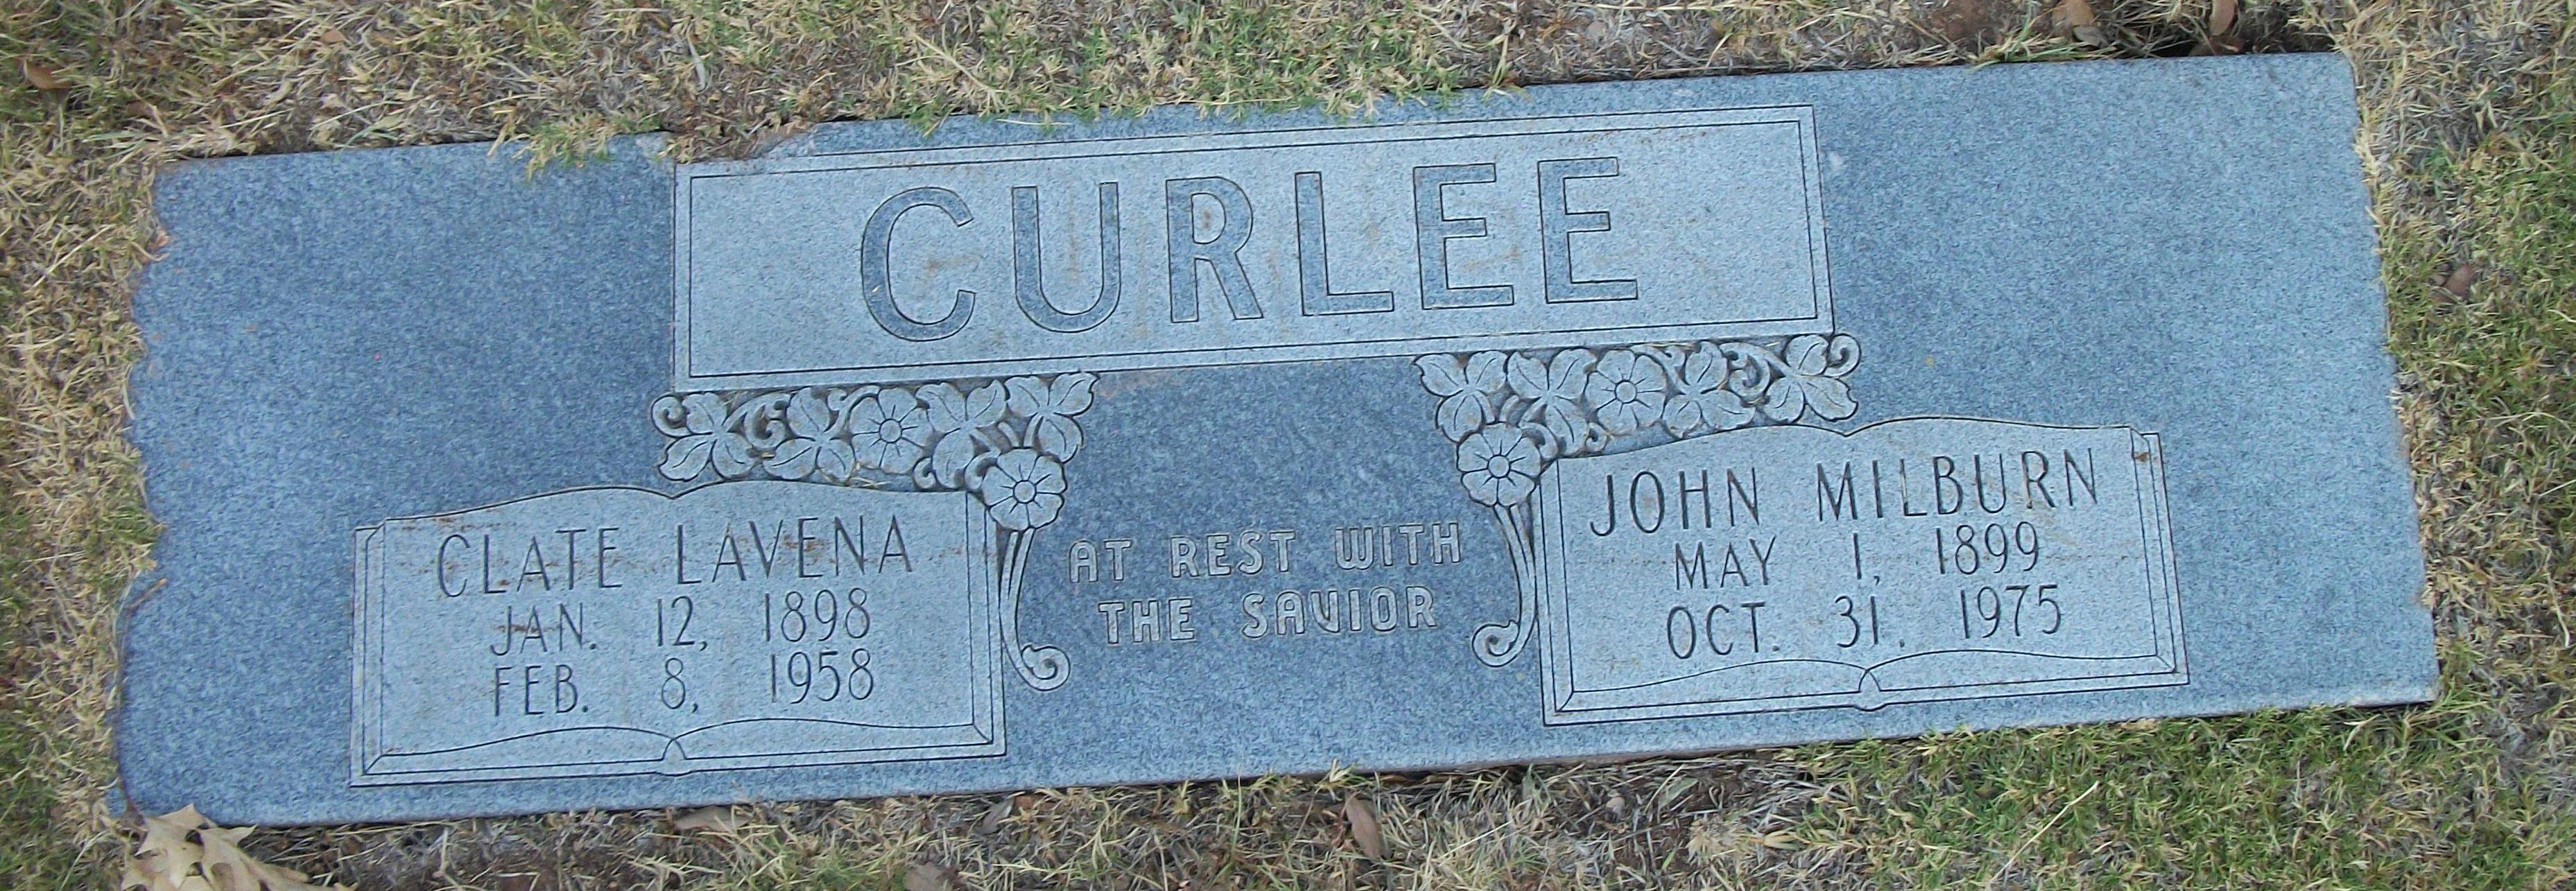 John Milburn Raines Curlee